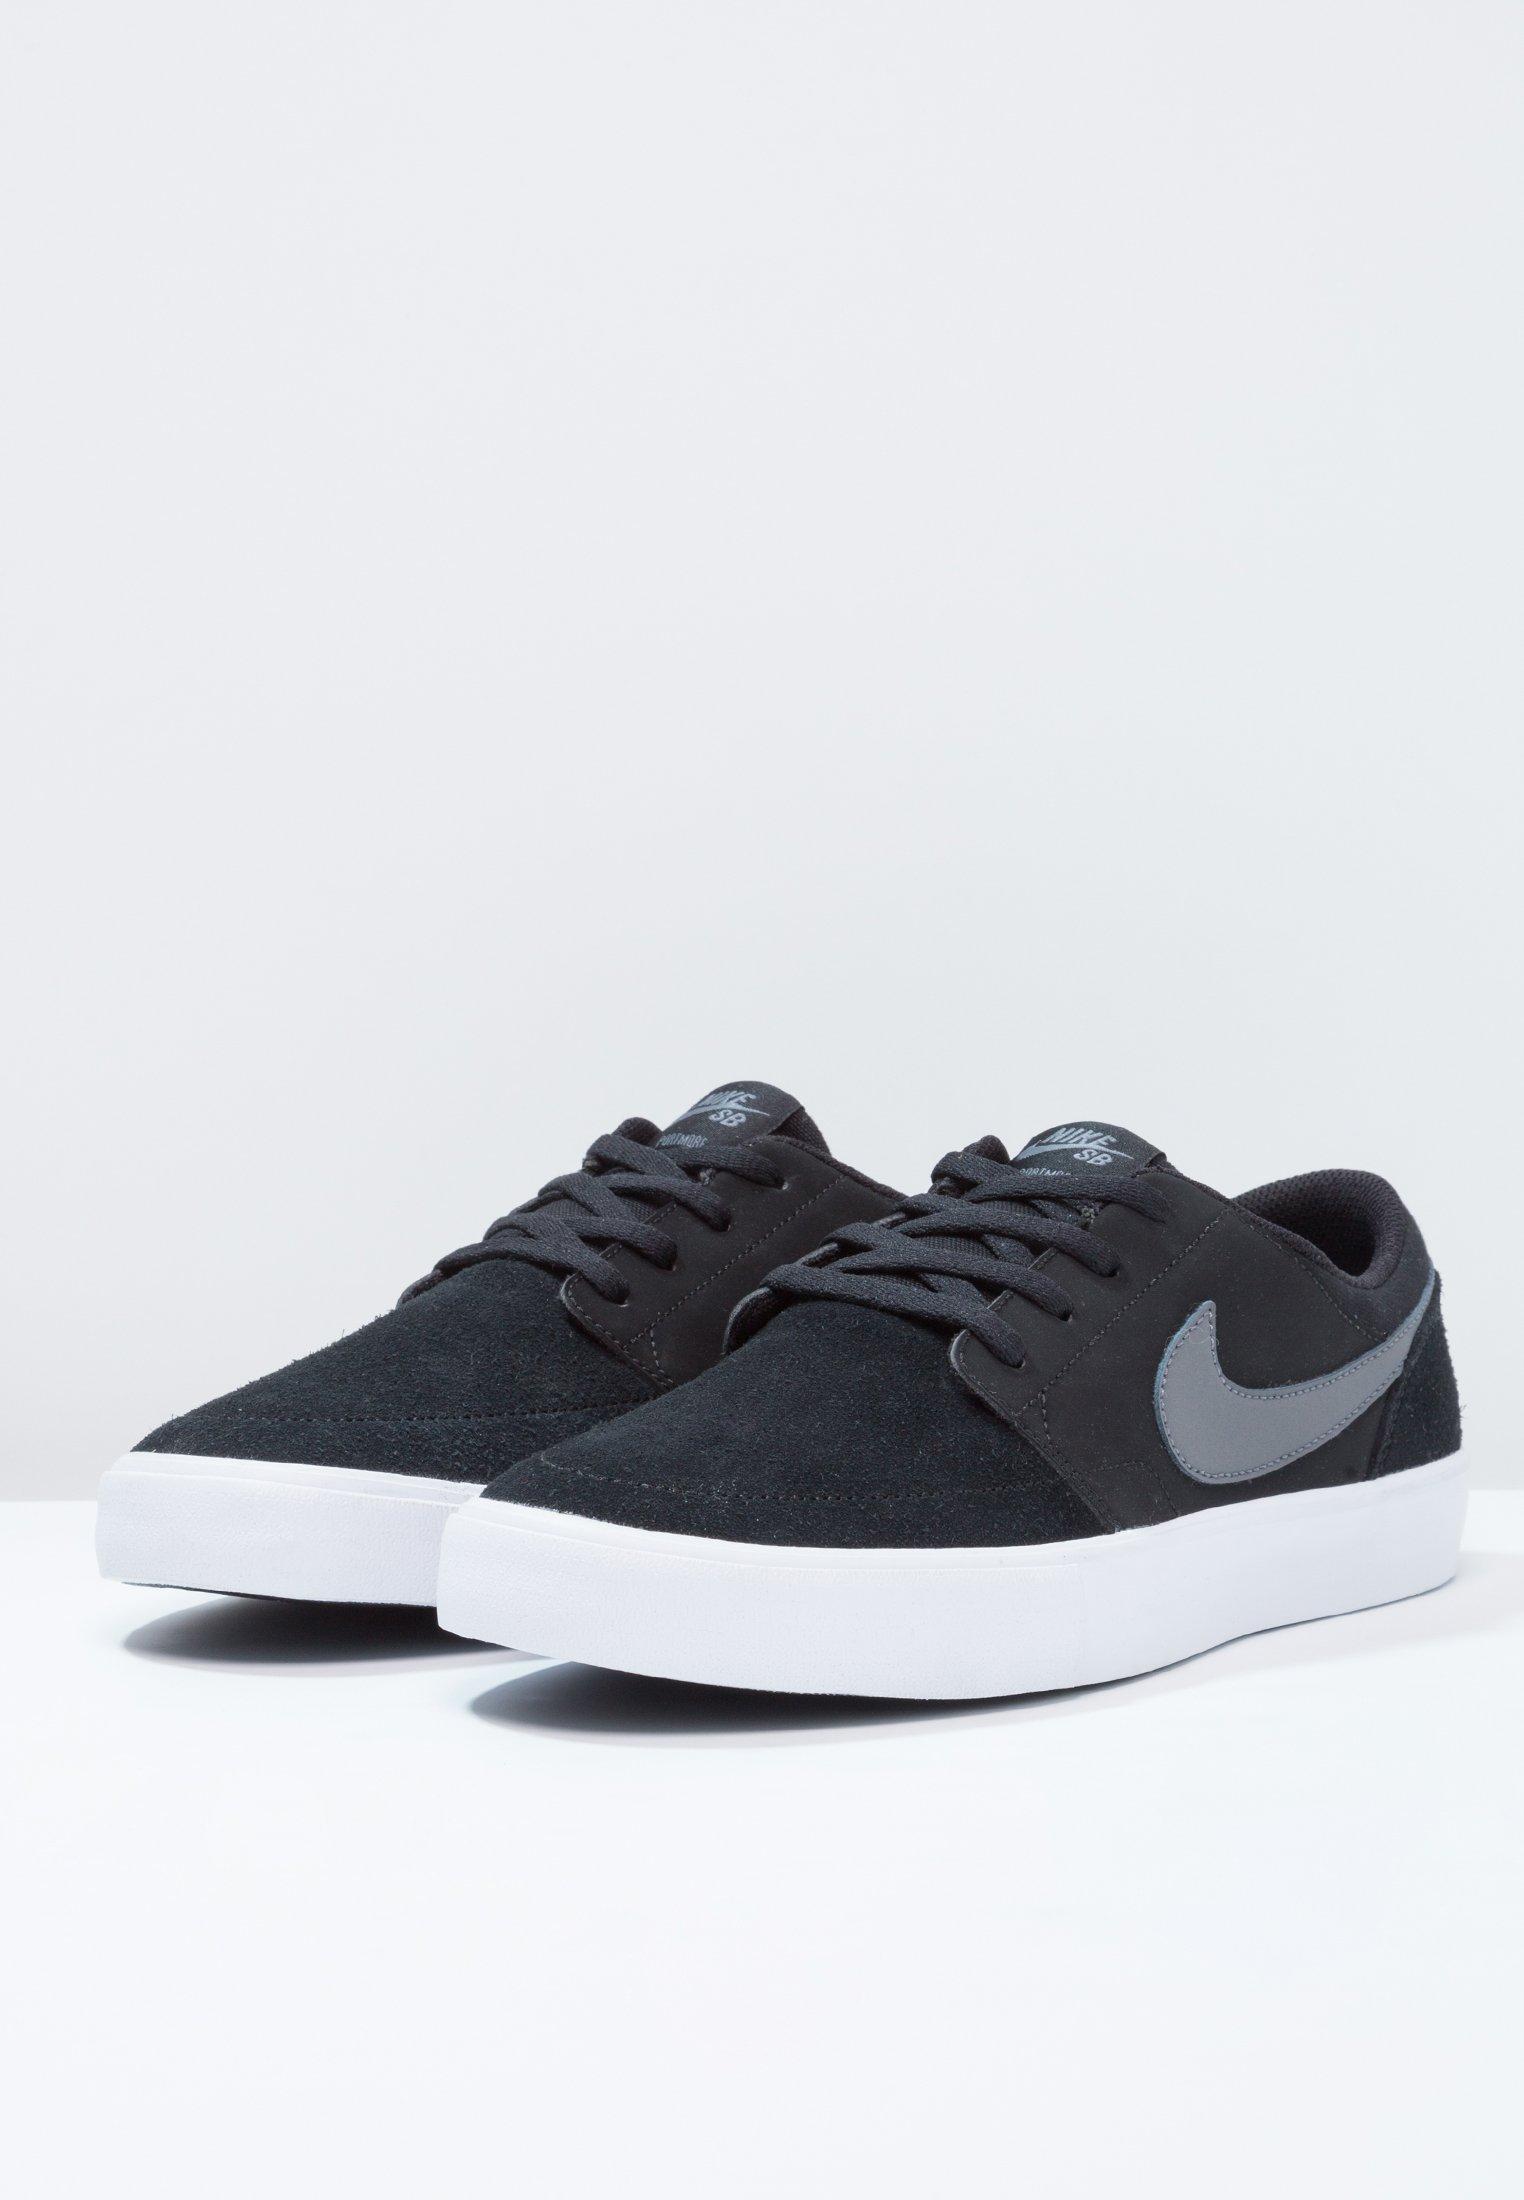 Nike SB Portmore II Solar Skate Shoes